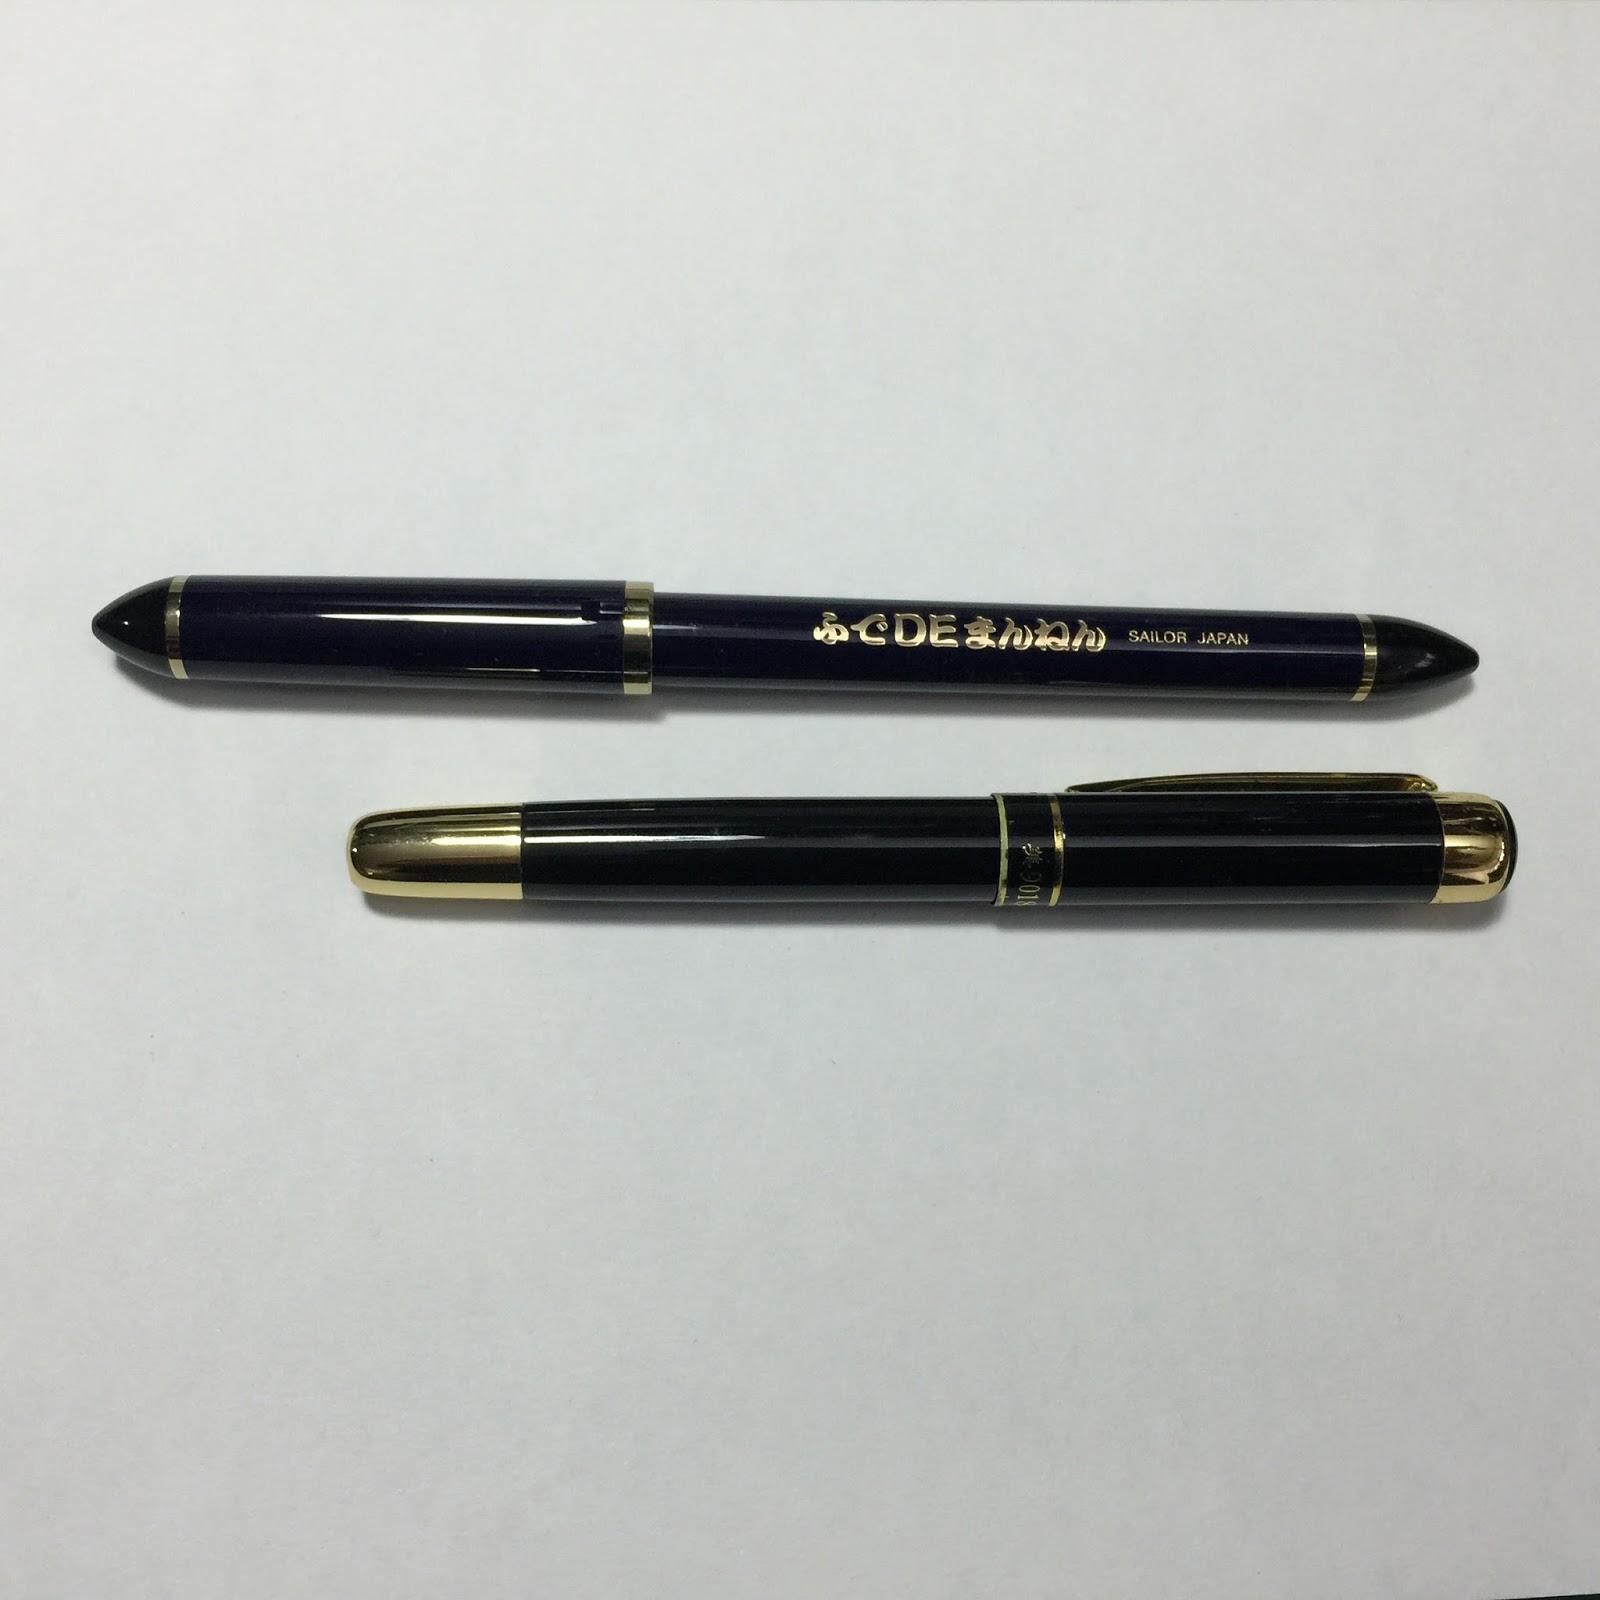 Heres A Sketch I Drew On Location Using The Sailor Fude De Mannnen Calligraphy Fountain Pen